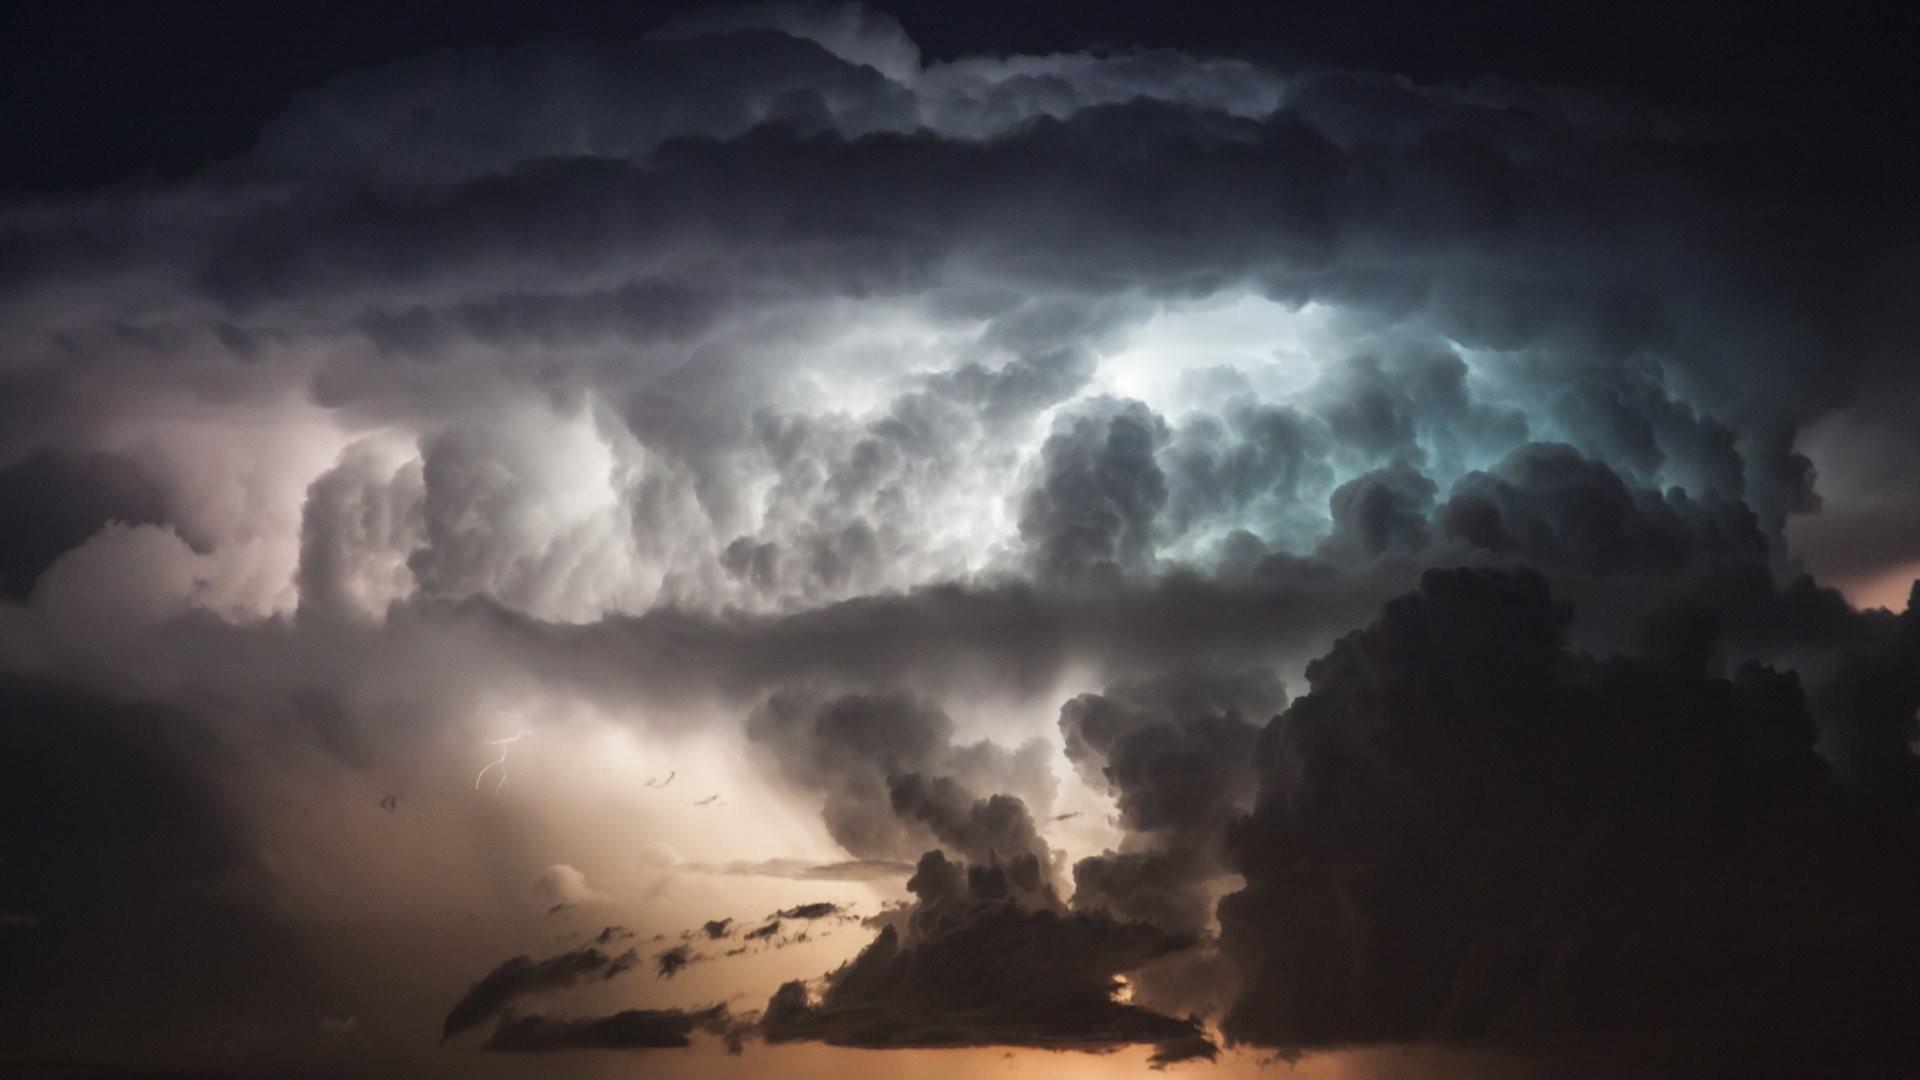 1920x1080, Thunderstorm Wallpaper   Data Id 291433 - Background Pc For Window 10 Thunderstorm - HD Wallpaper